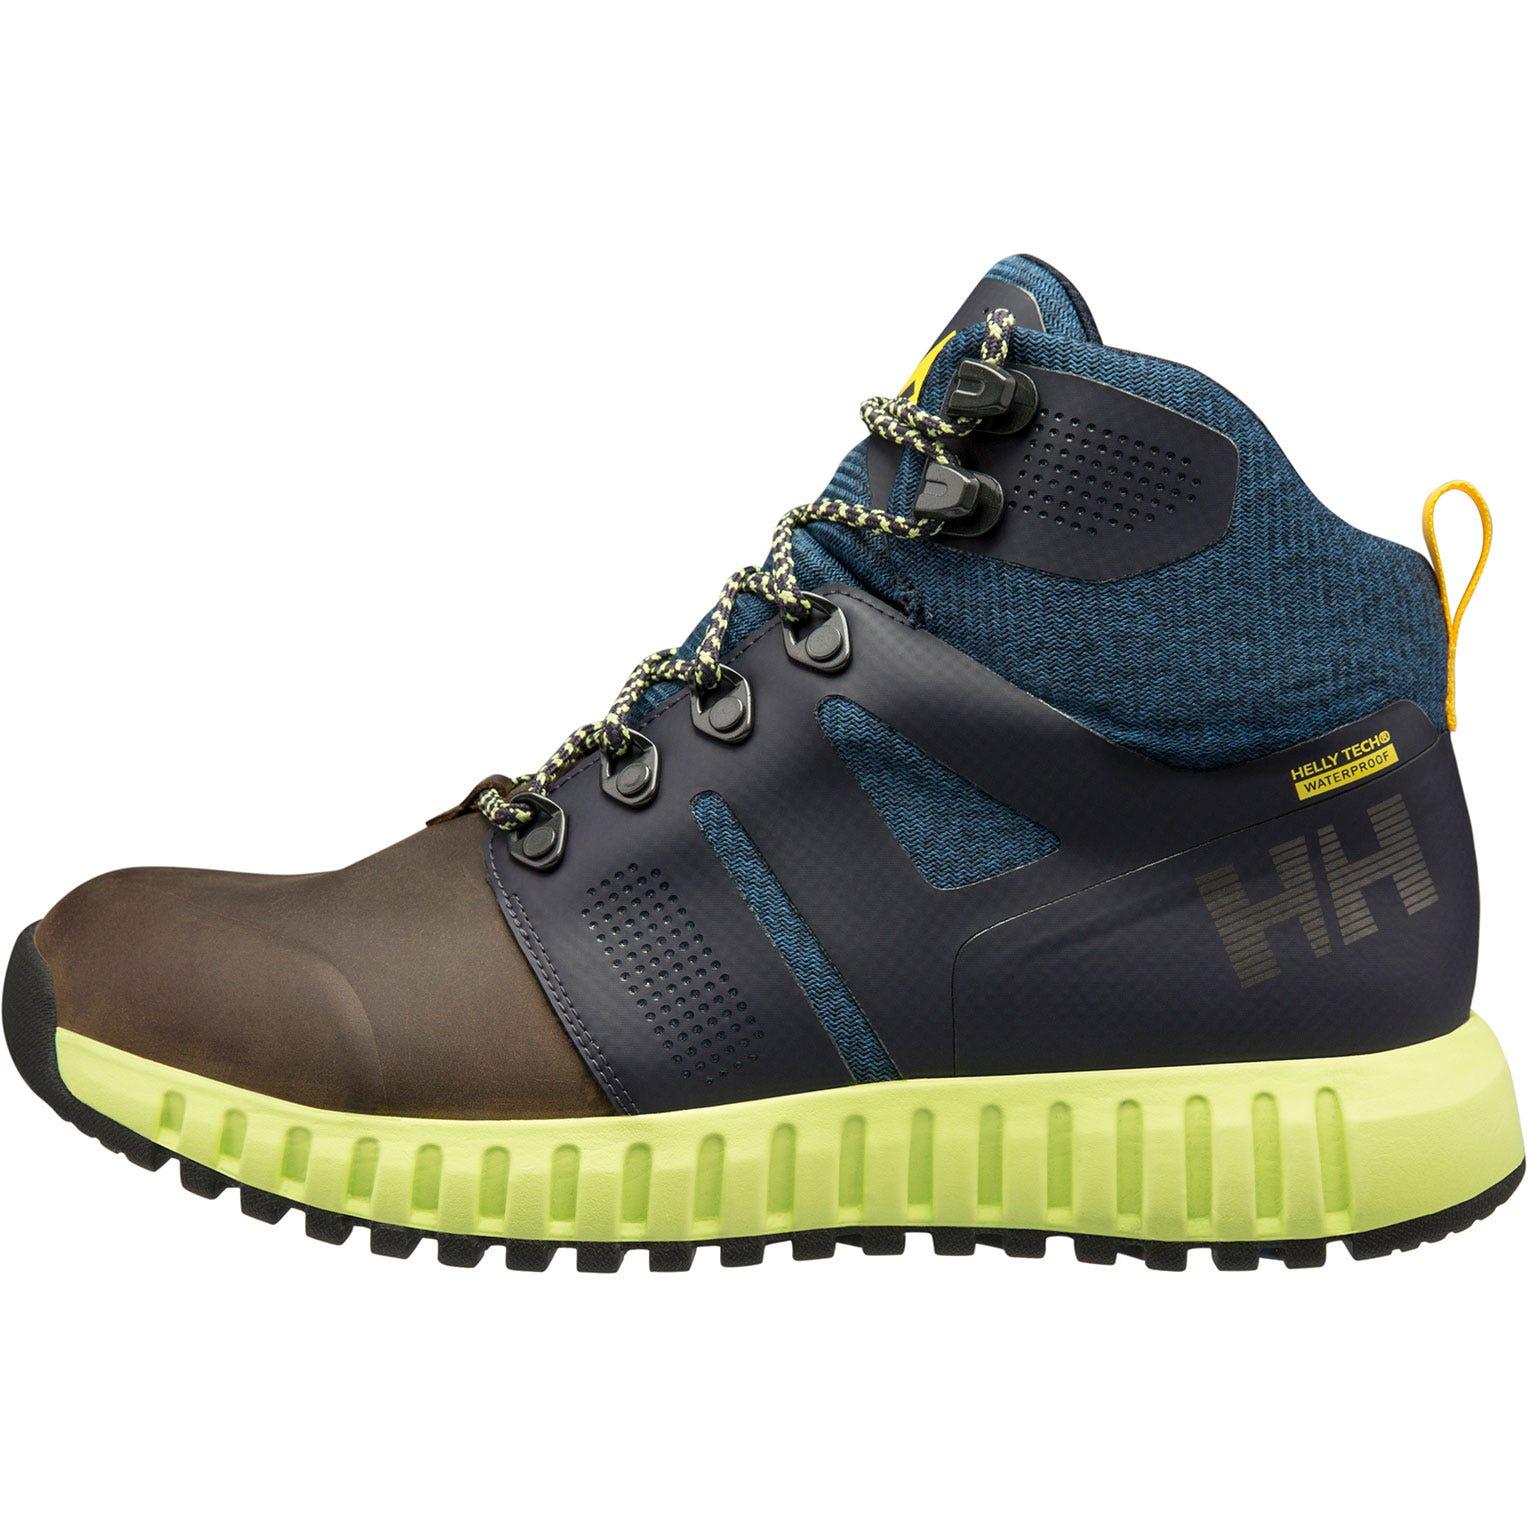 Helly Hansen Vanir Gallivant Ht Mens Hiking Boot Blue 42.5/9